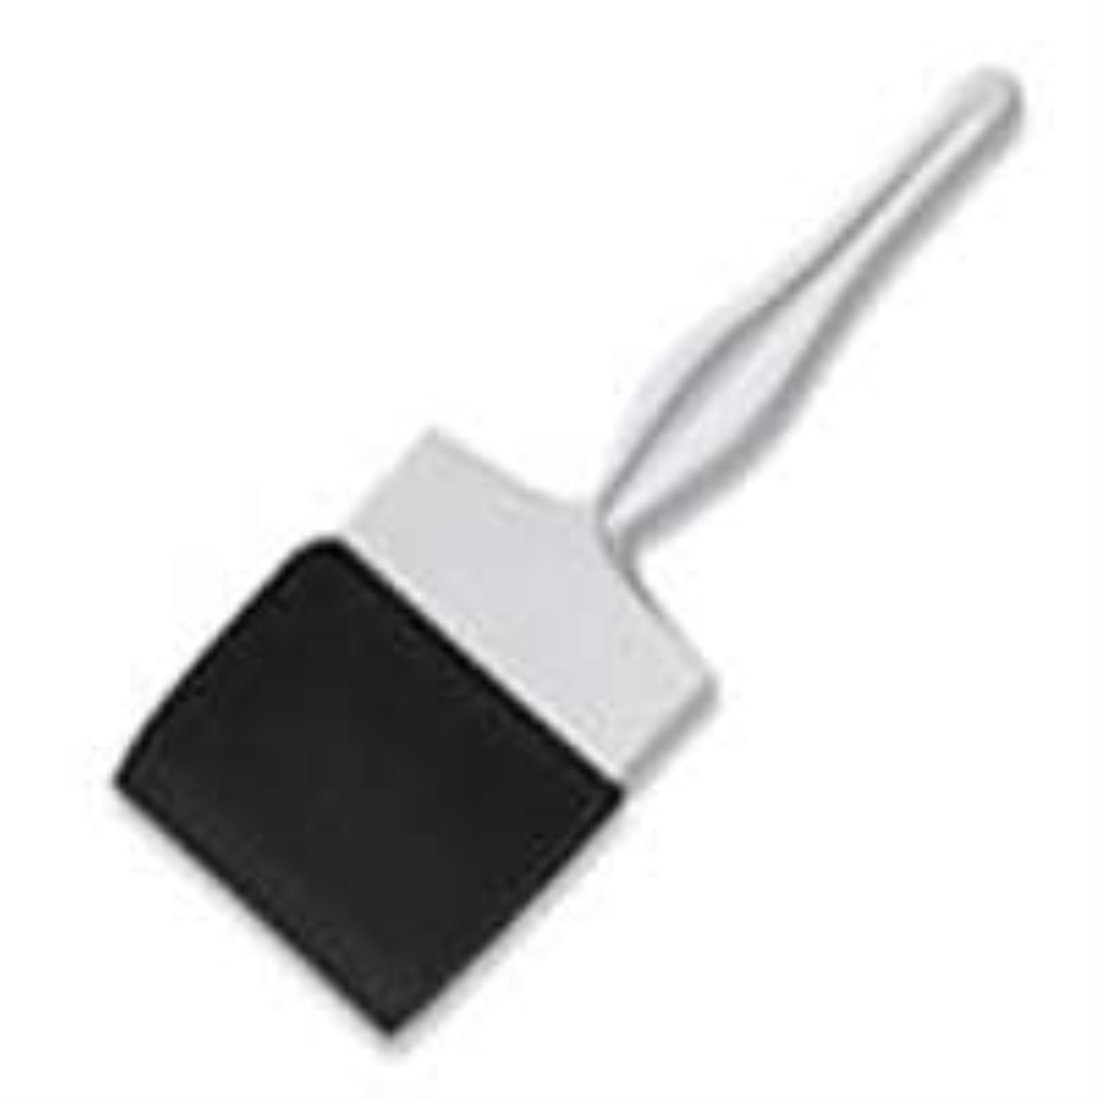 Wooster Brush 3103-3 Foam King Paintbrush 3-Inch 3 Inch